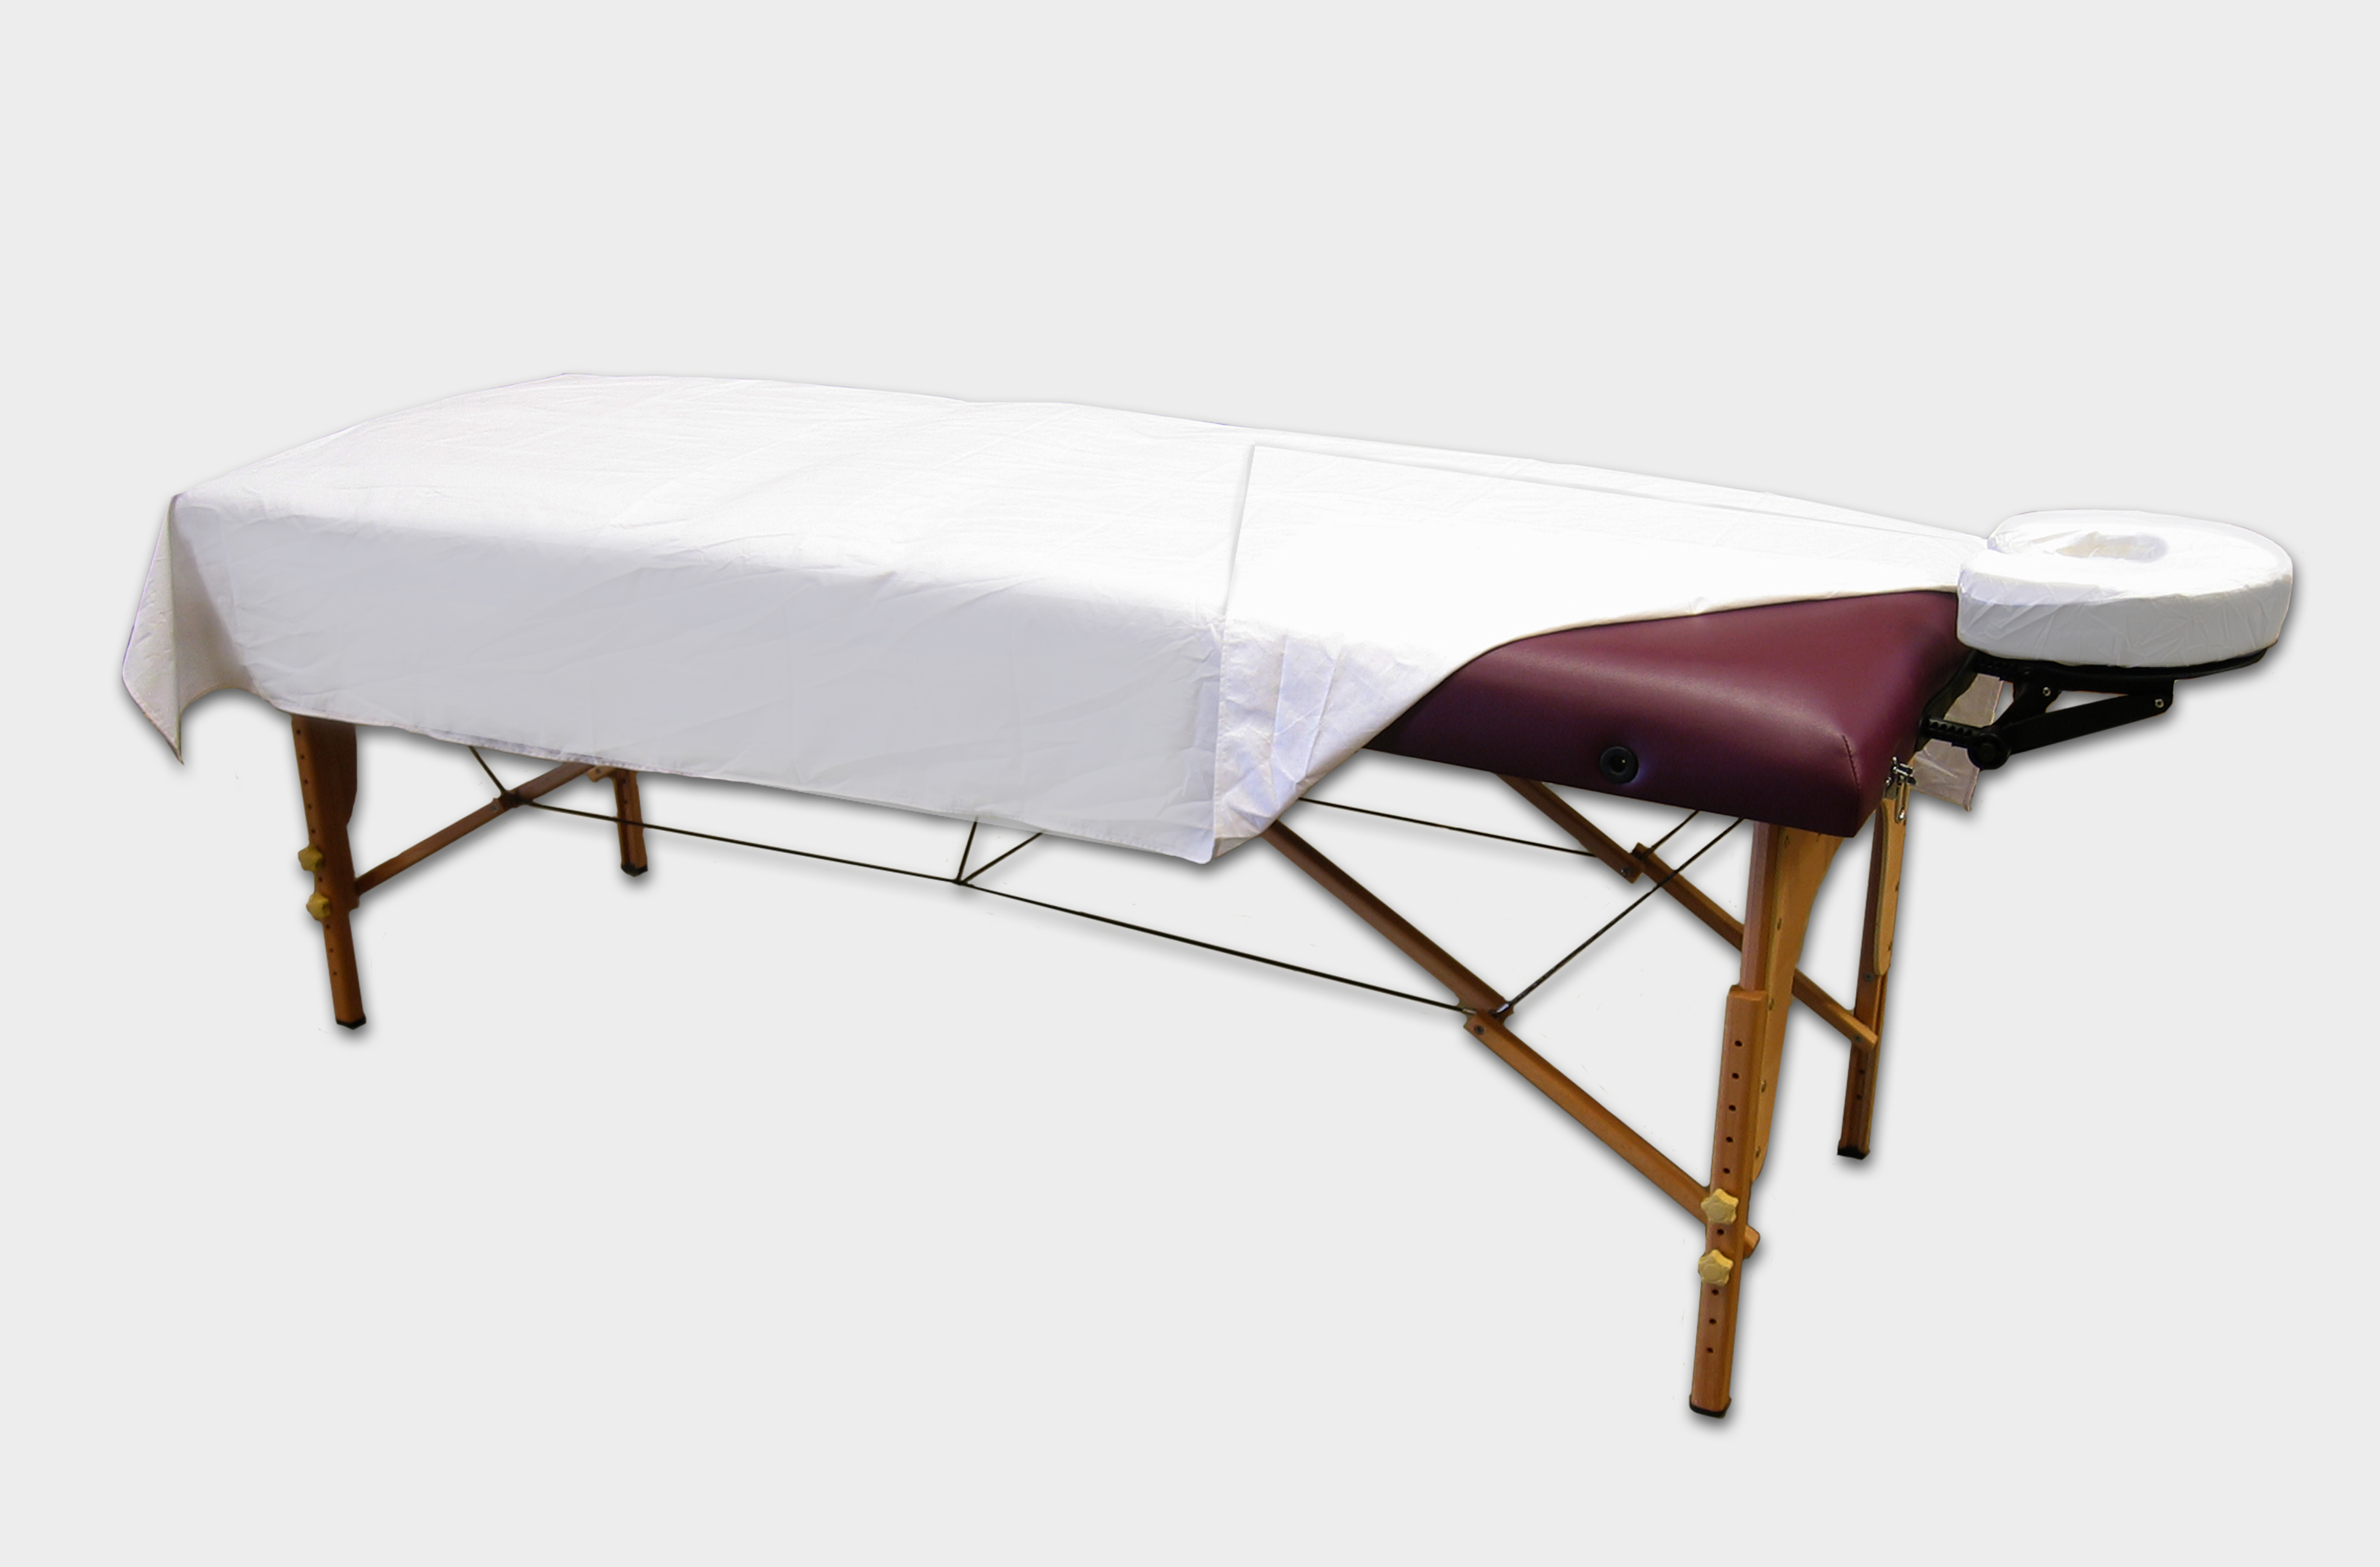 Onetouch Massage Table Sheet Set 2 Flat Sheets 1 Face Cradle